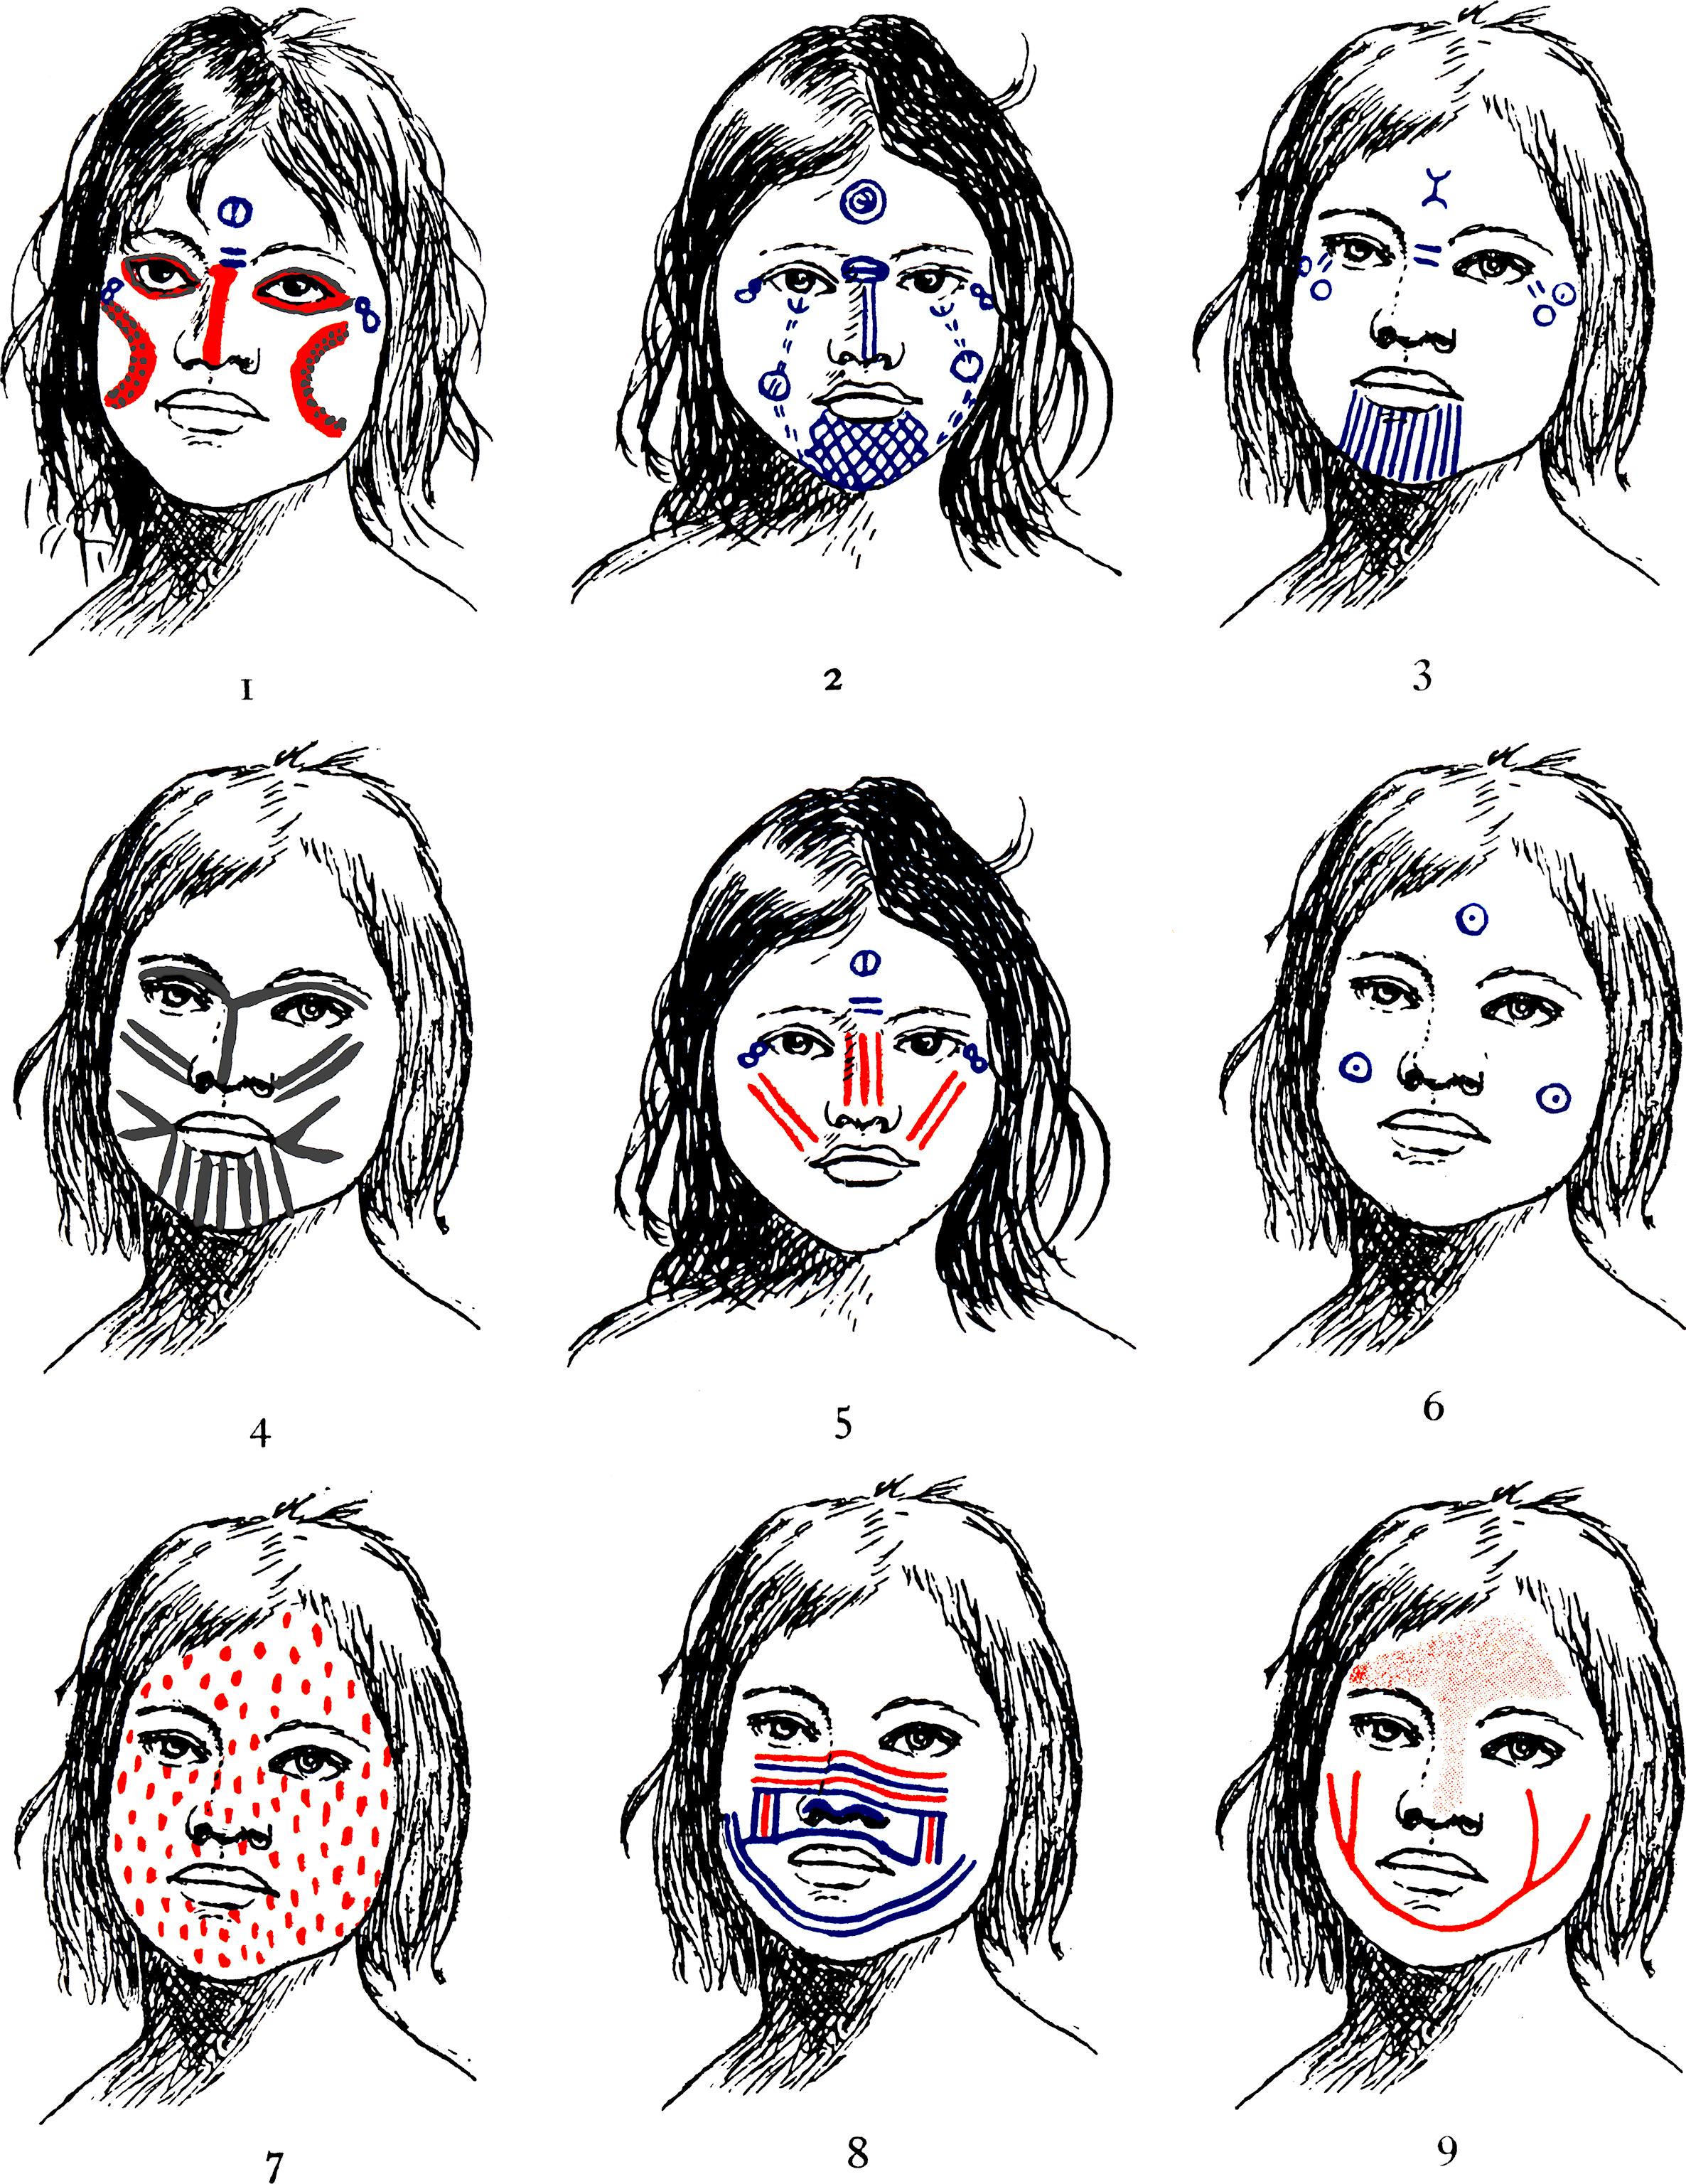 Pintura Facial Indigena Pinturas Indigena Pintura Facial